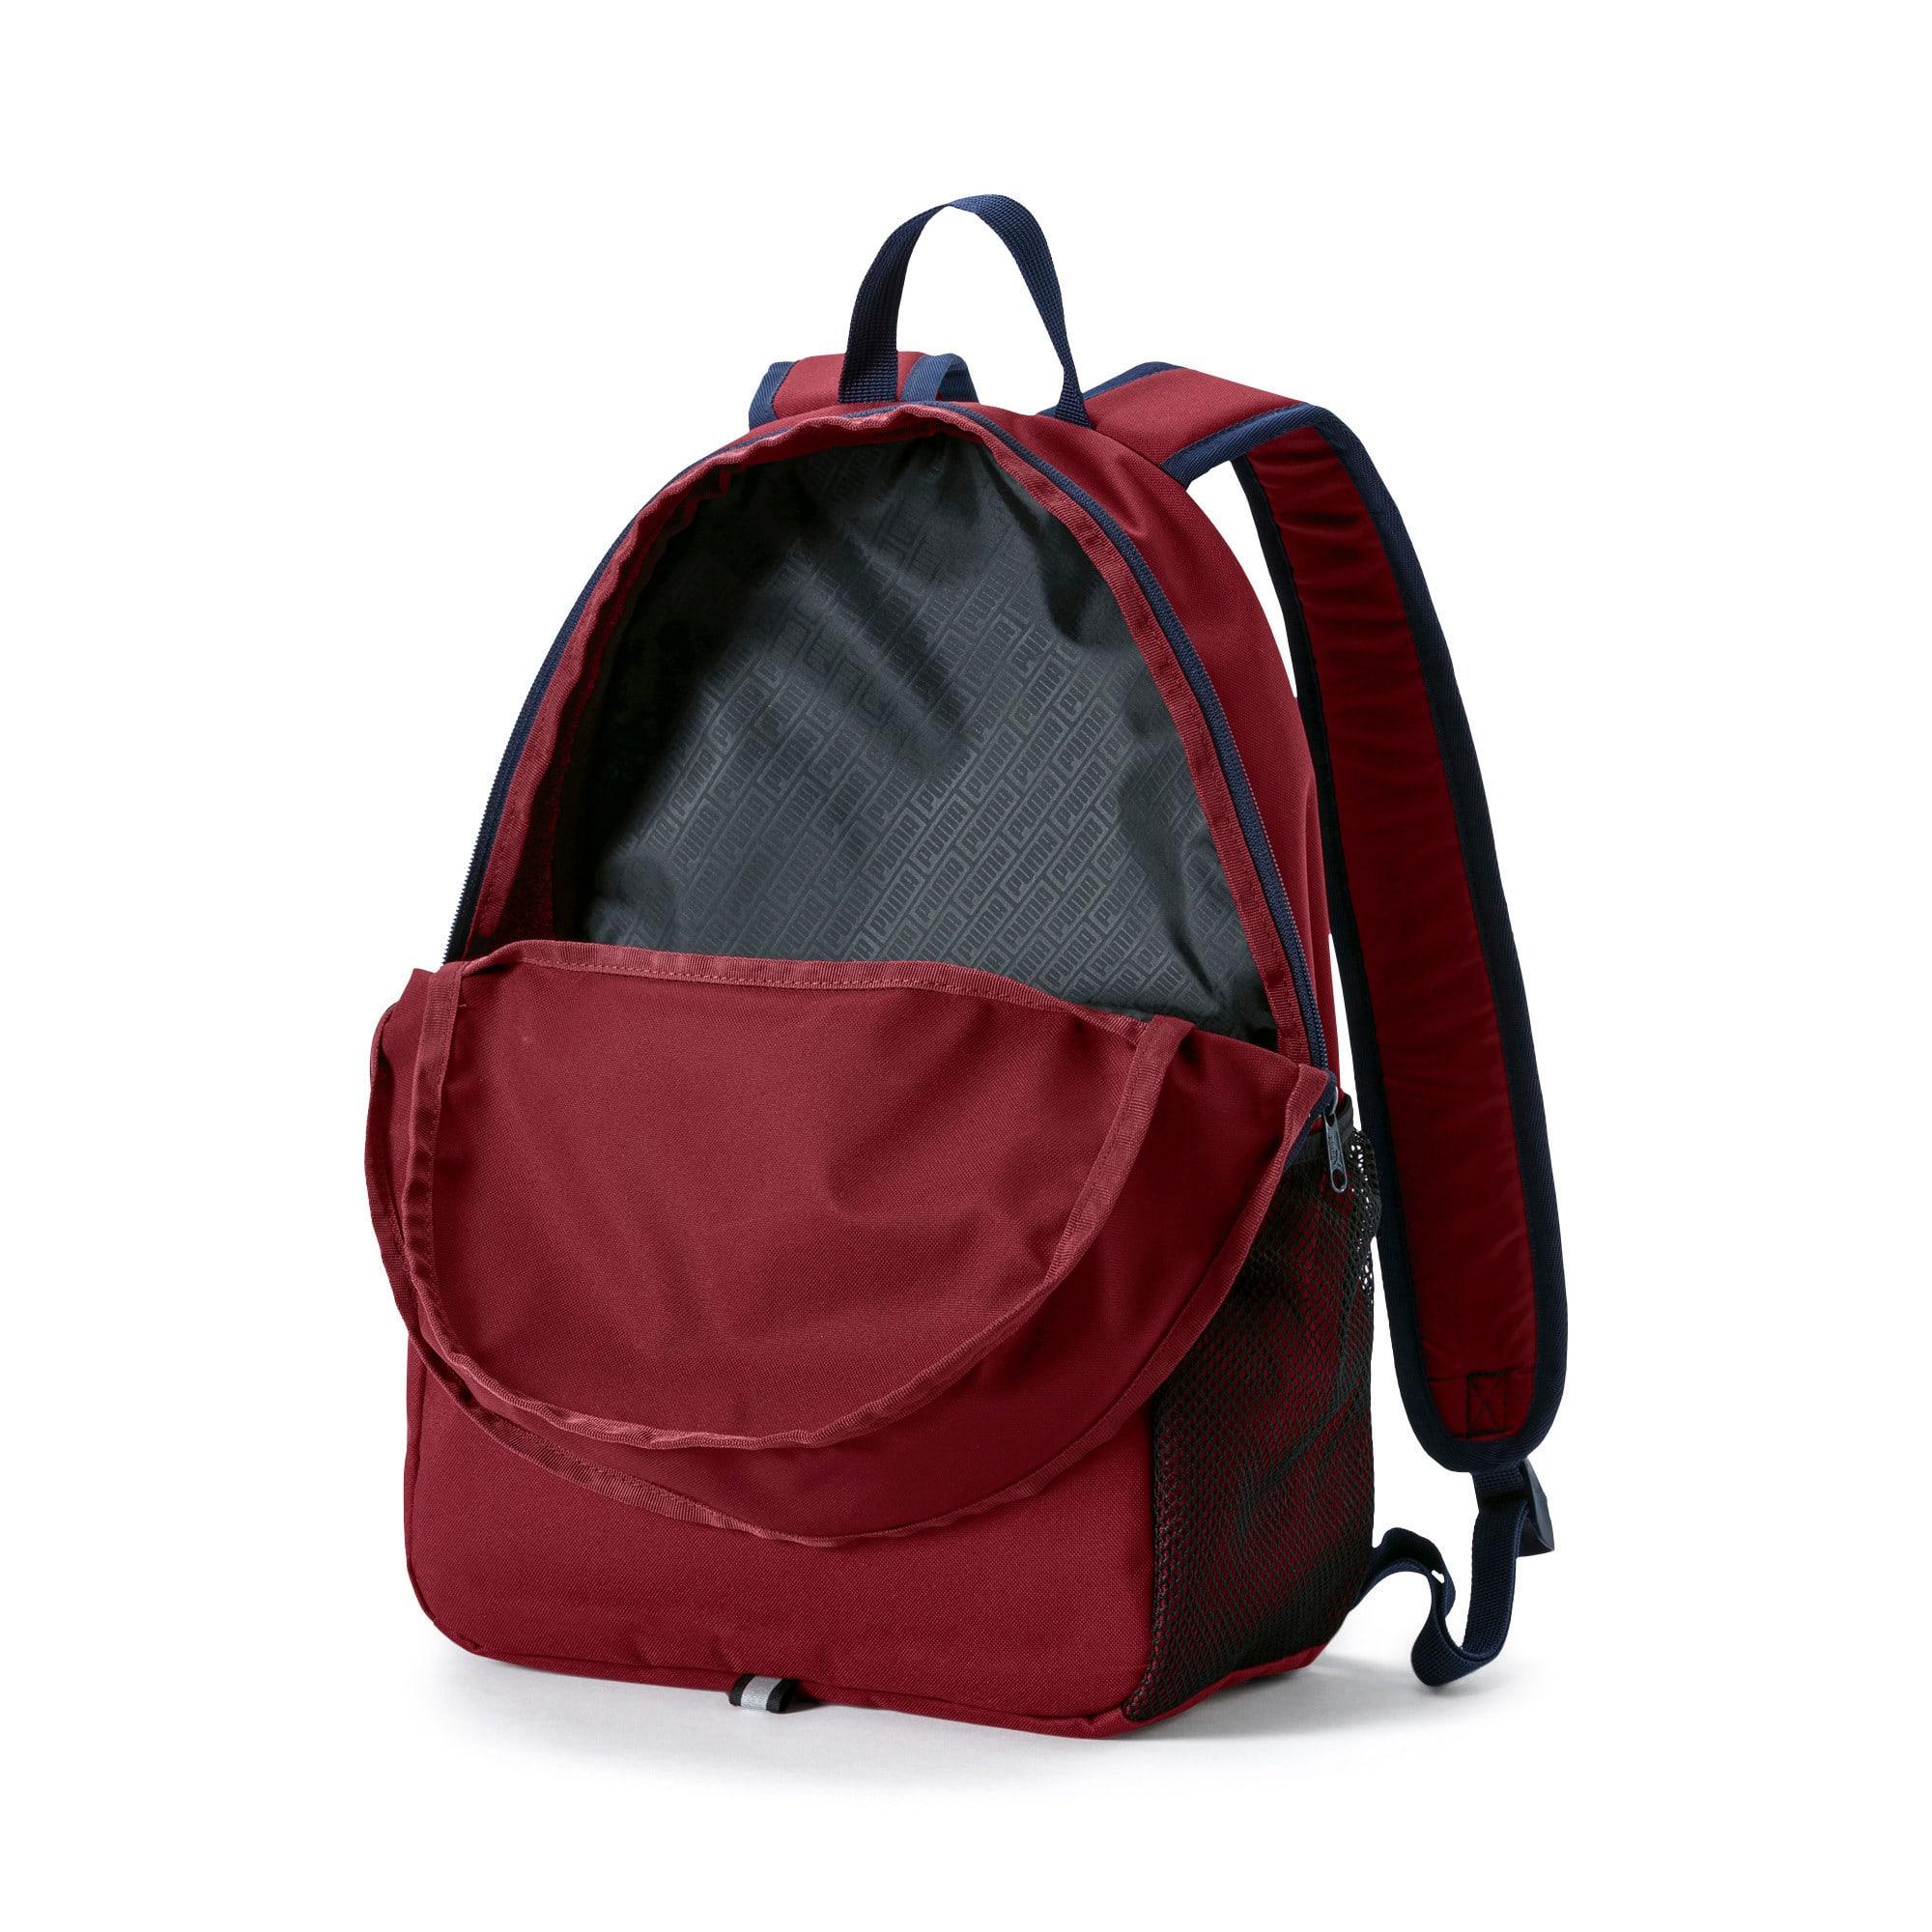 Thumbnail 3 of Phase Backpack II, Pomegranate, medium-IND